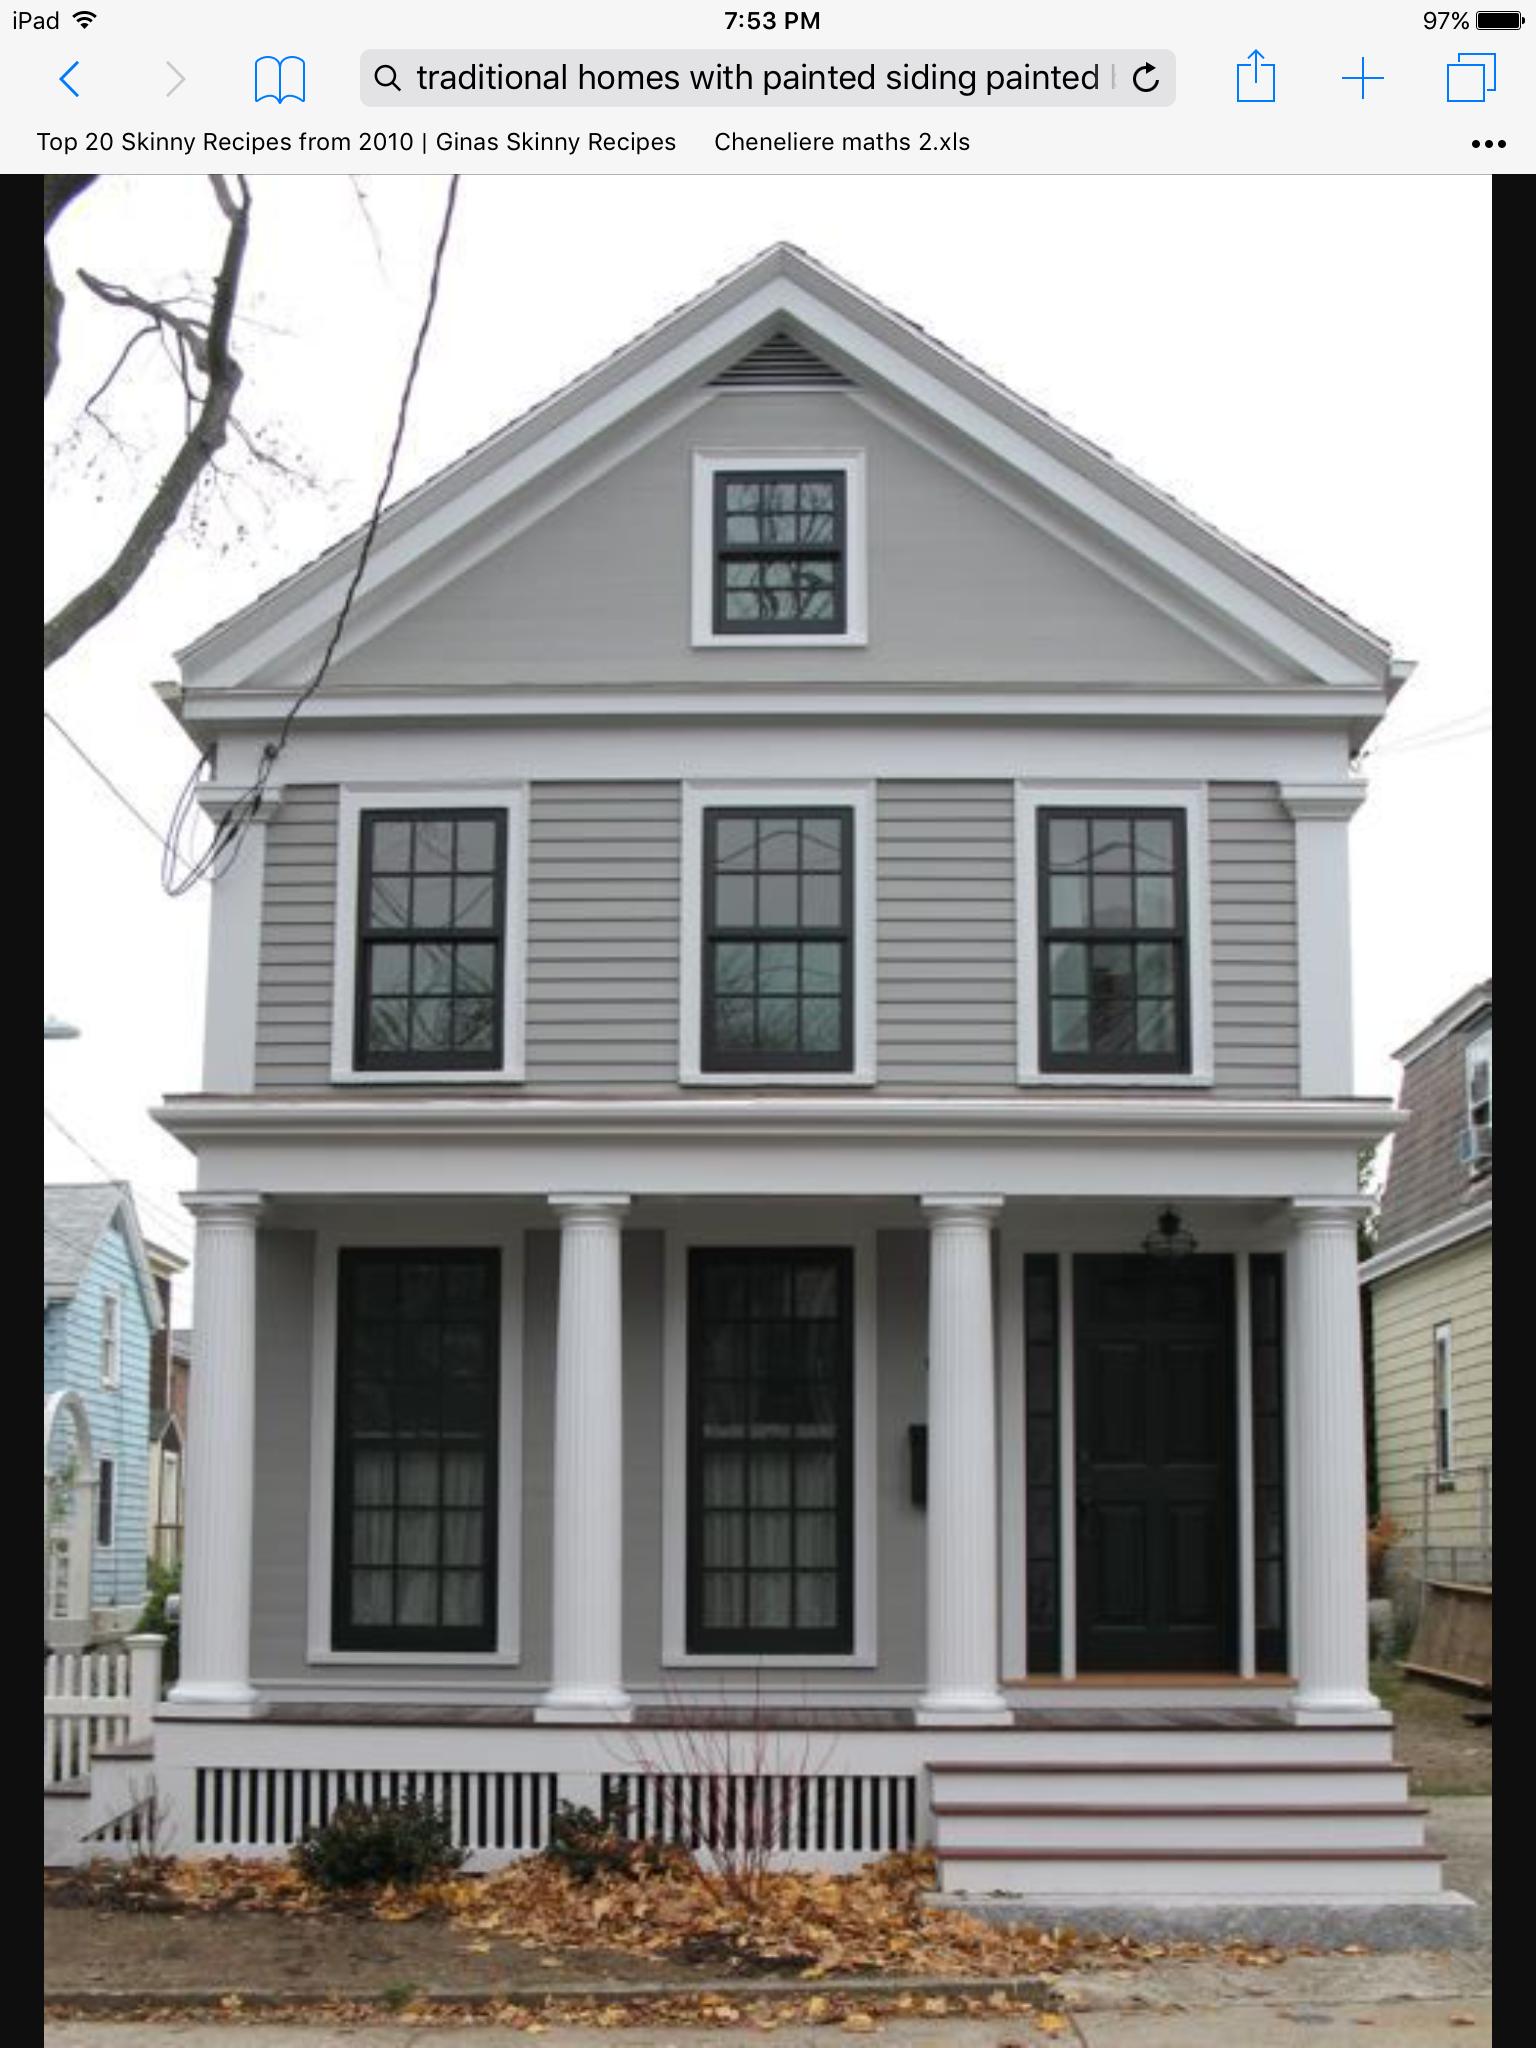 Grey Siding White Trim Black Door And Window Panes House Paint Exterior Exterior Paint Colors For House Exterior House Colors